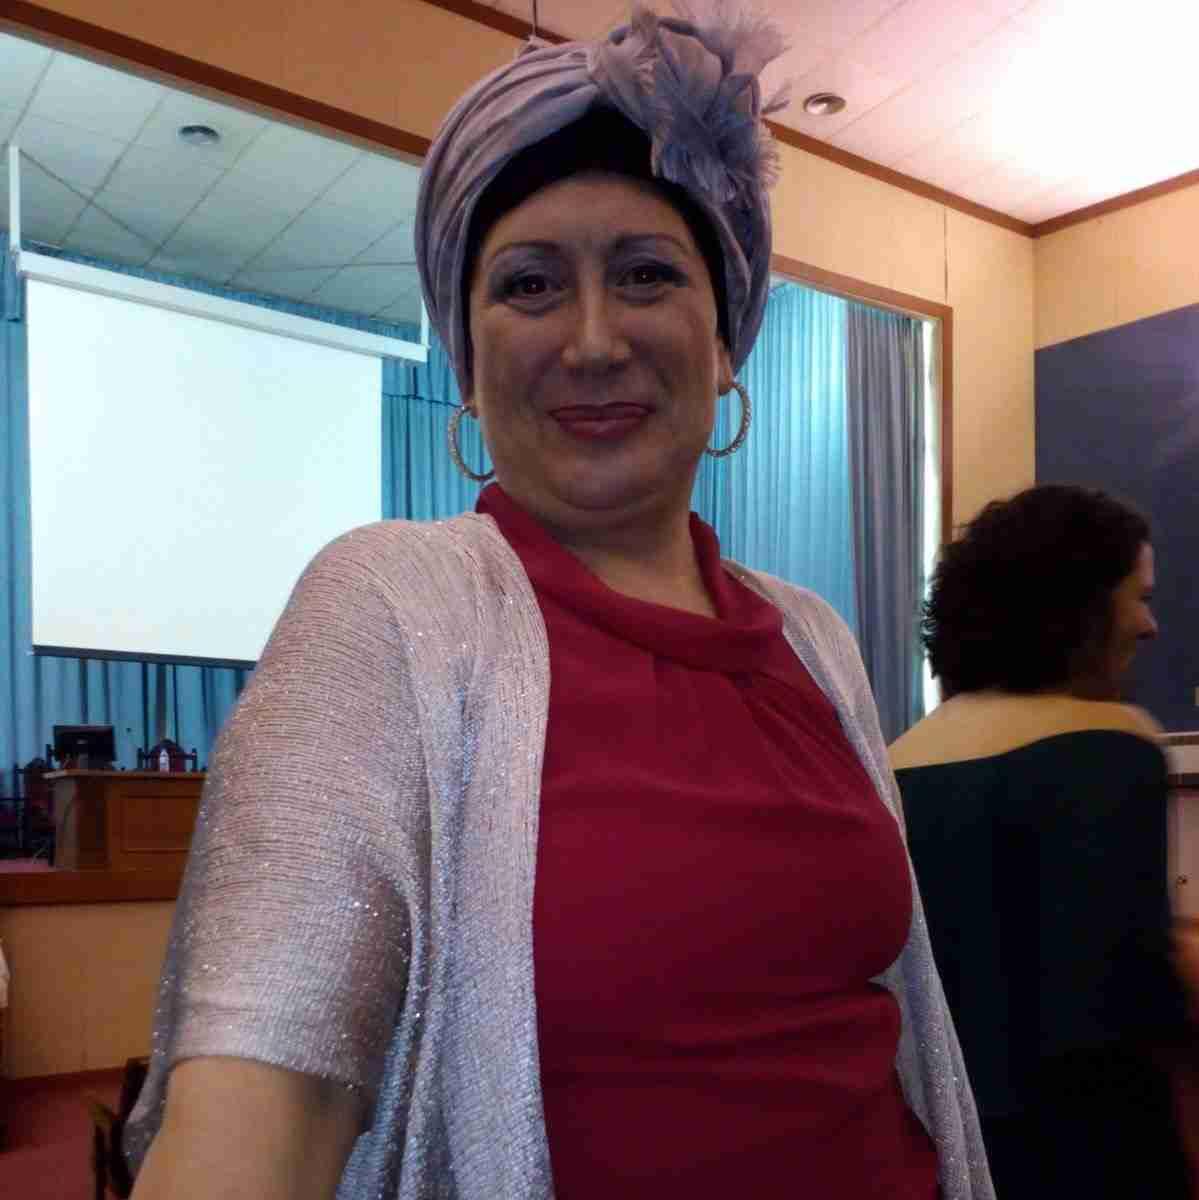 Pilar F. Huertas